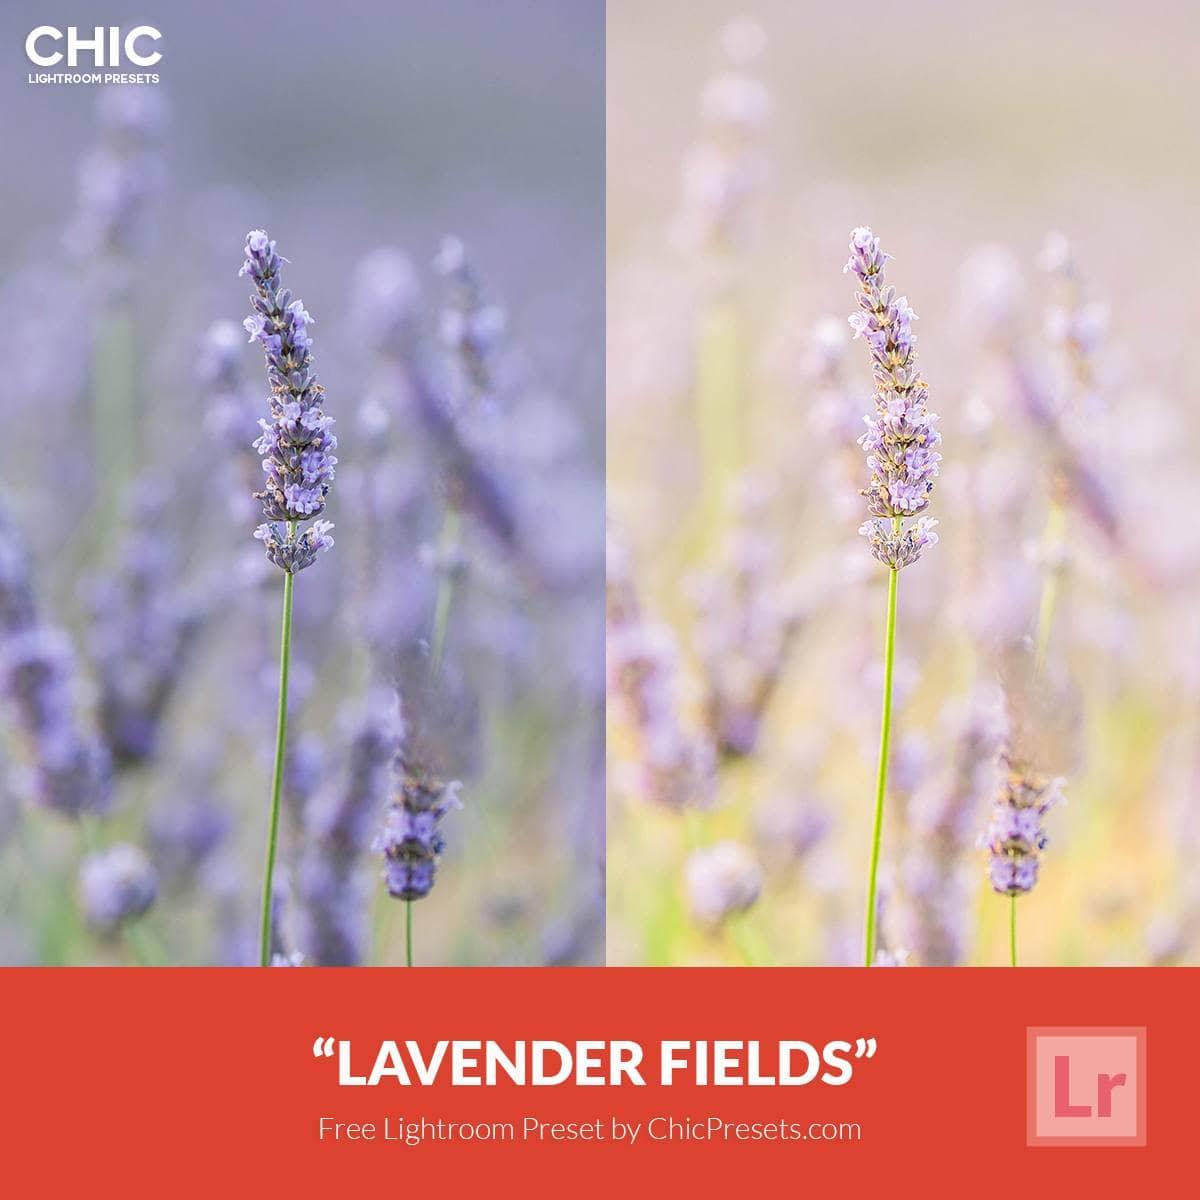 Free-Lightroom-Preset-Lavender-Fields-5